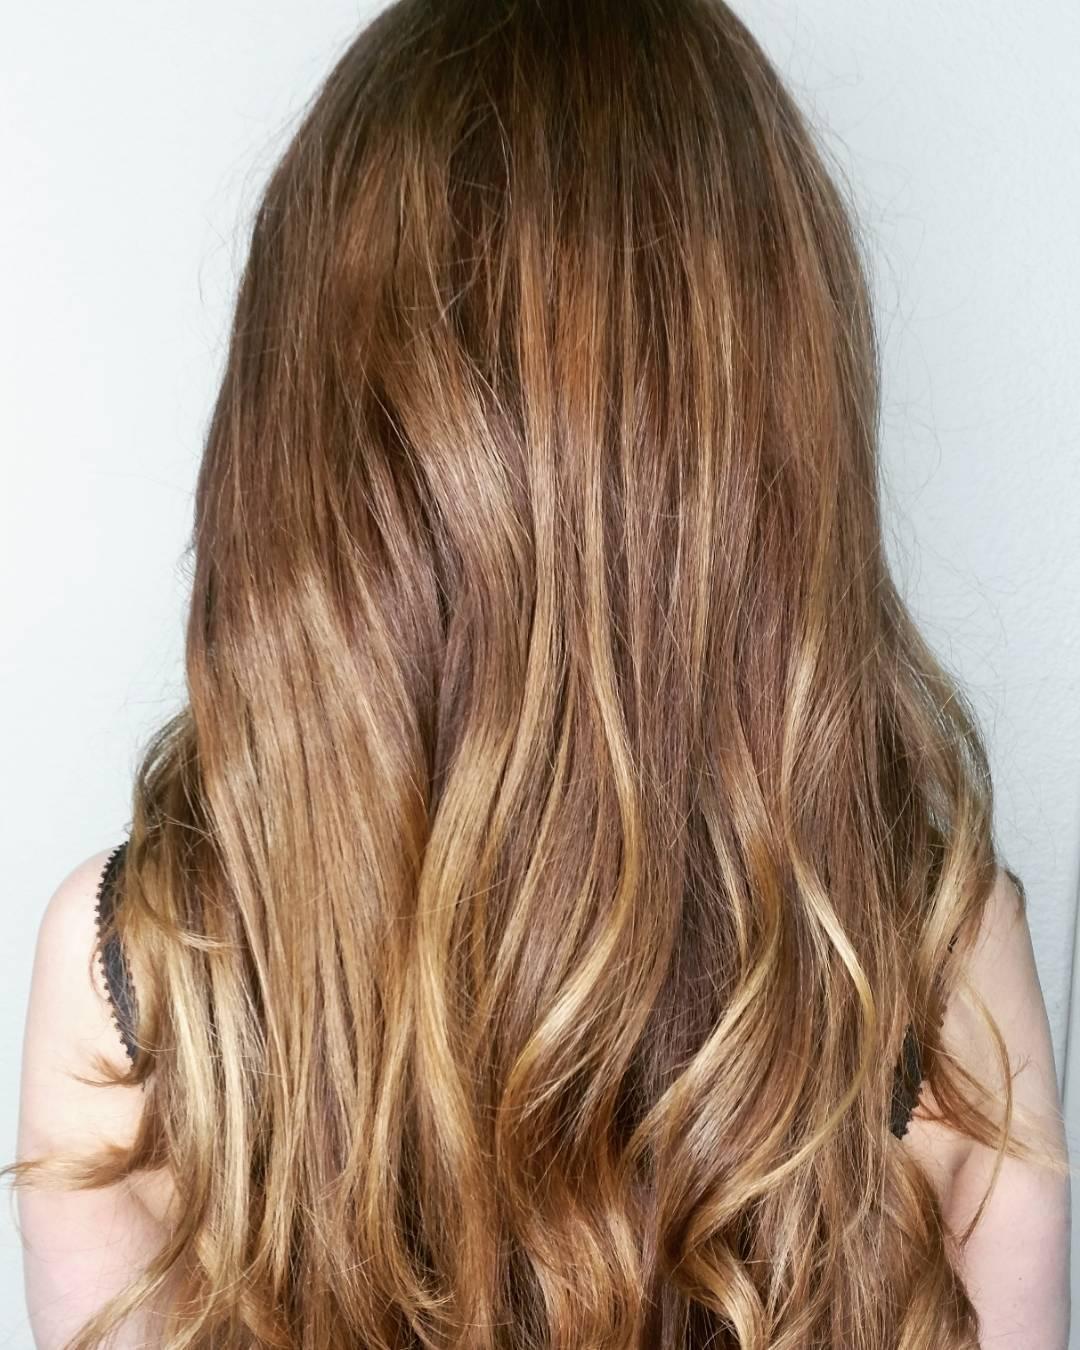 Olga Demskaya Las Vegas Hair 12.jpg